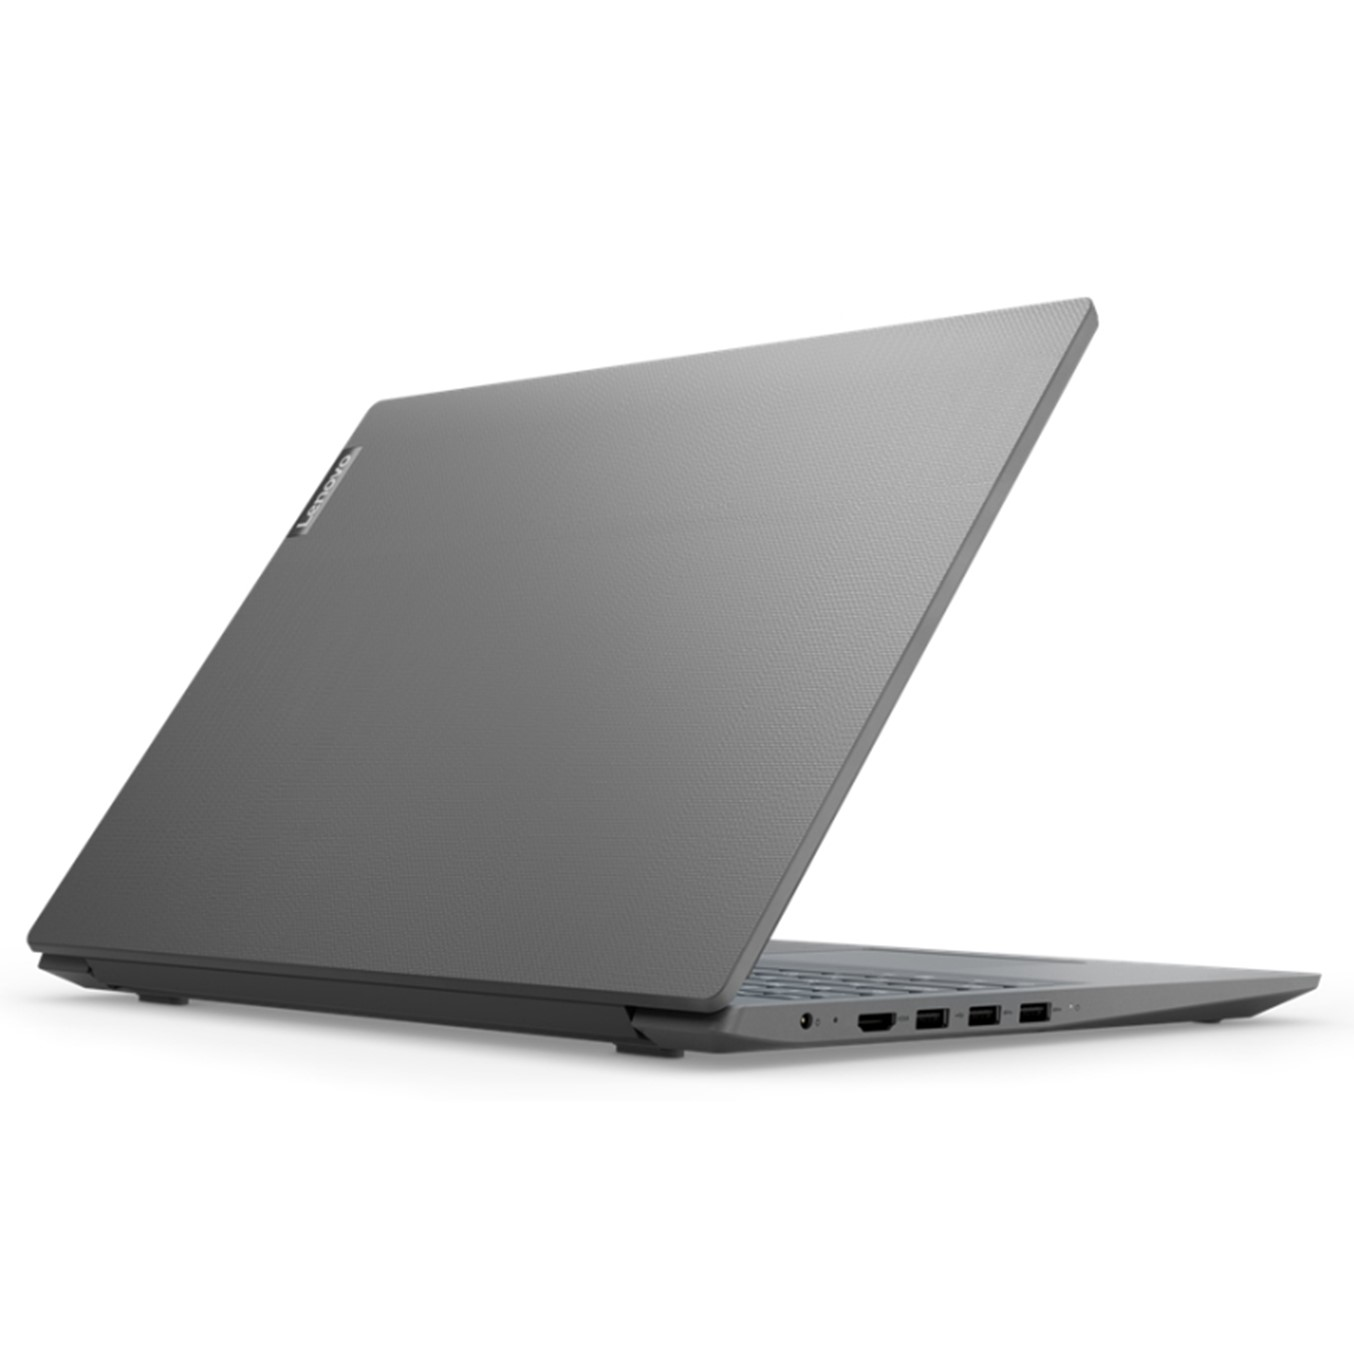 "PORTATIL LENOVO V15 IGL CEL N4020 15.6"" 4GB / SSD256GB / WIFI / BT / W10"